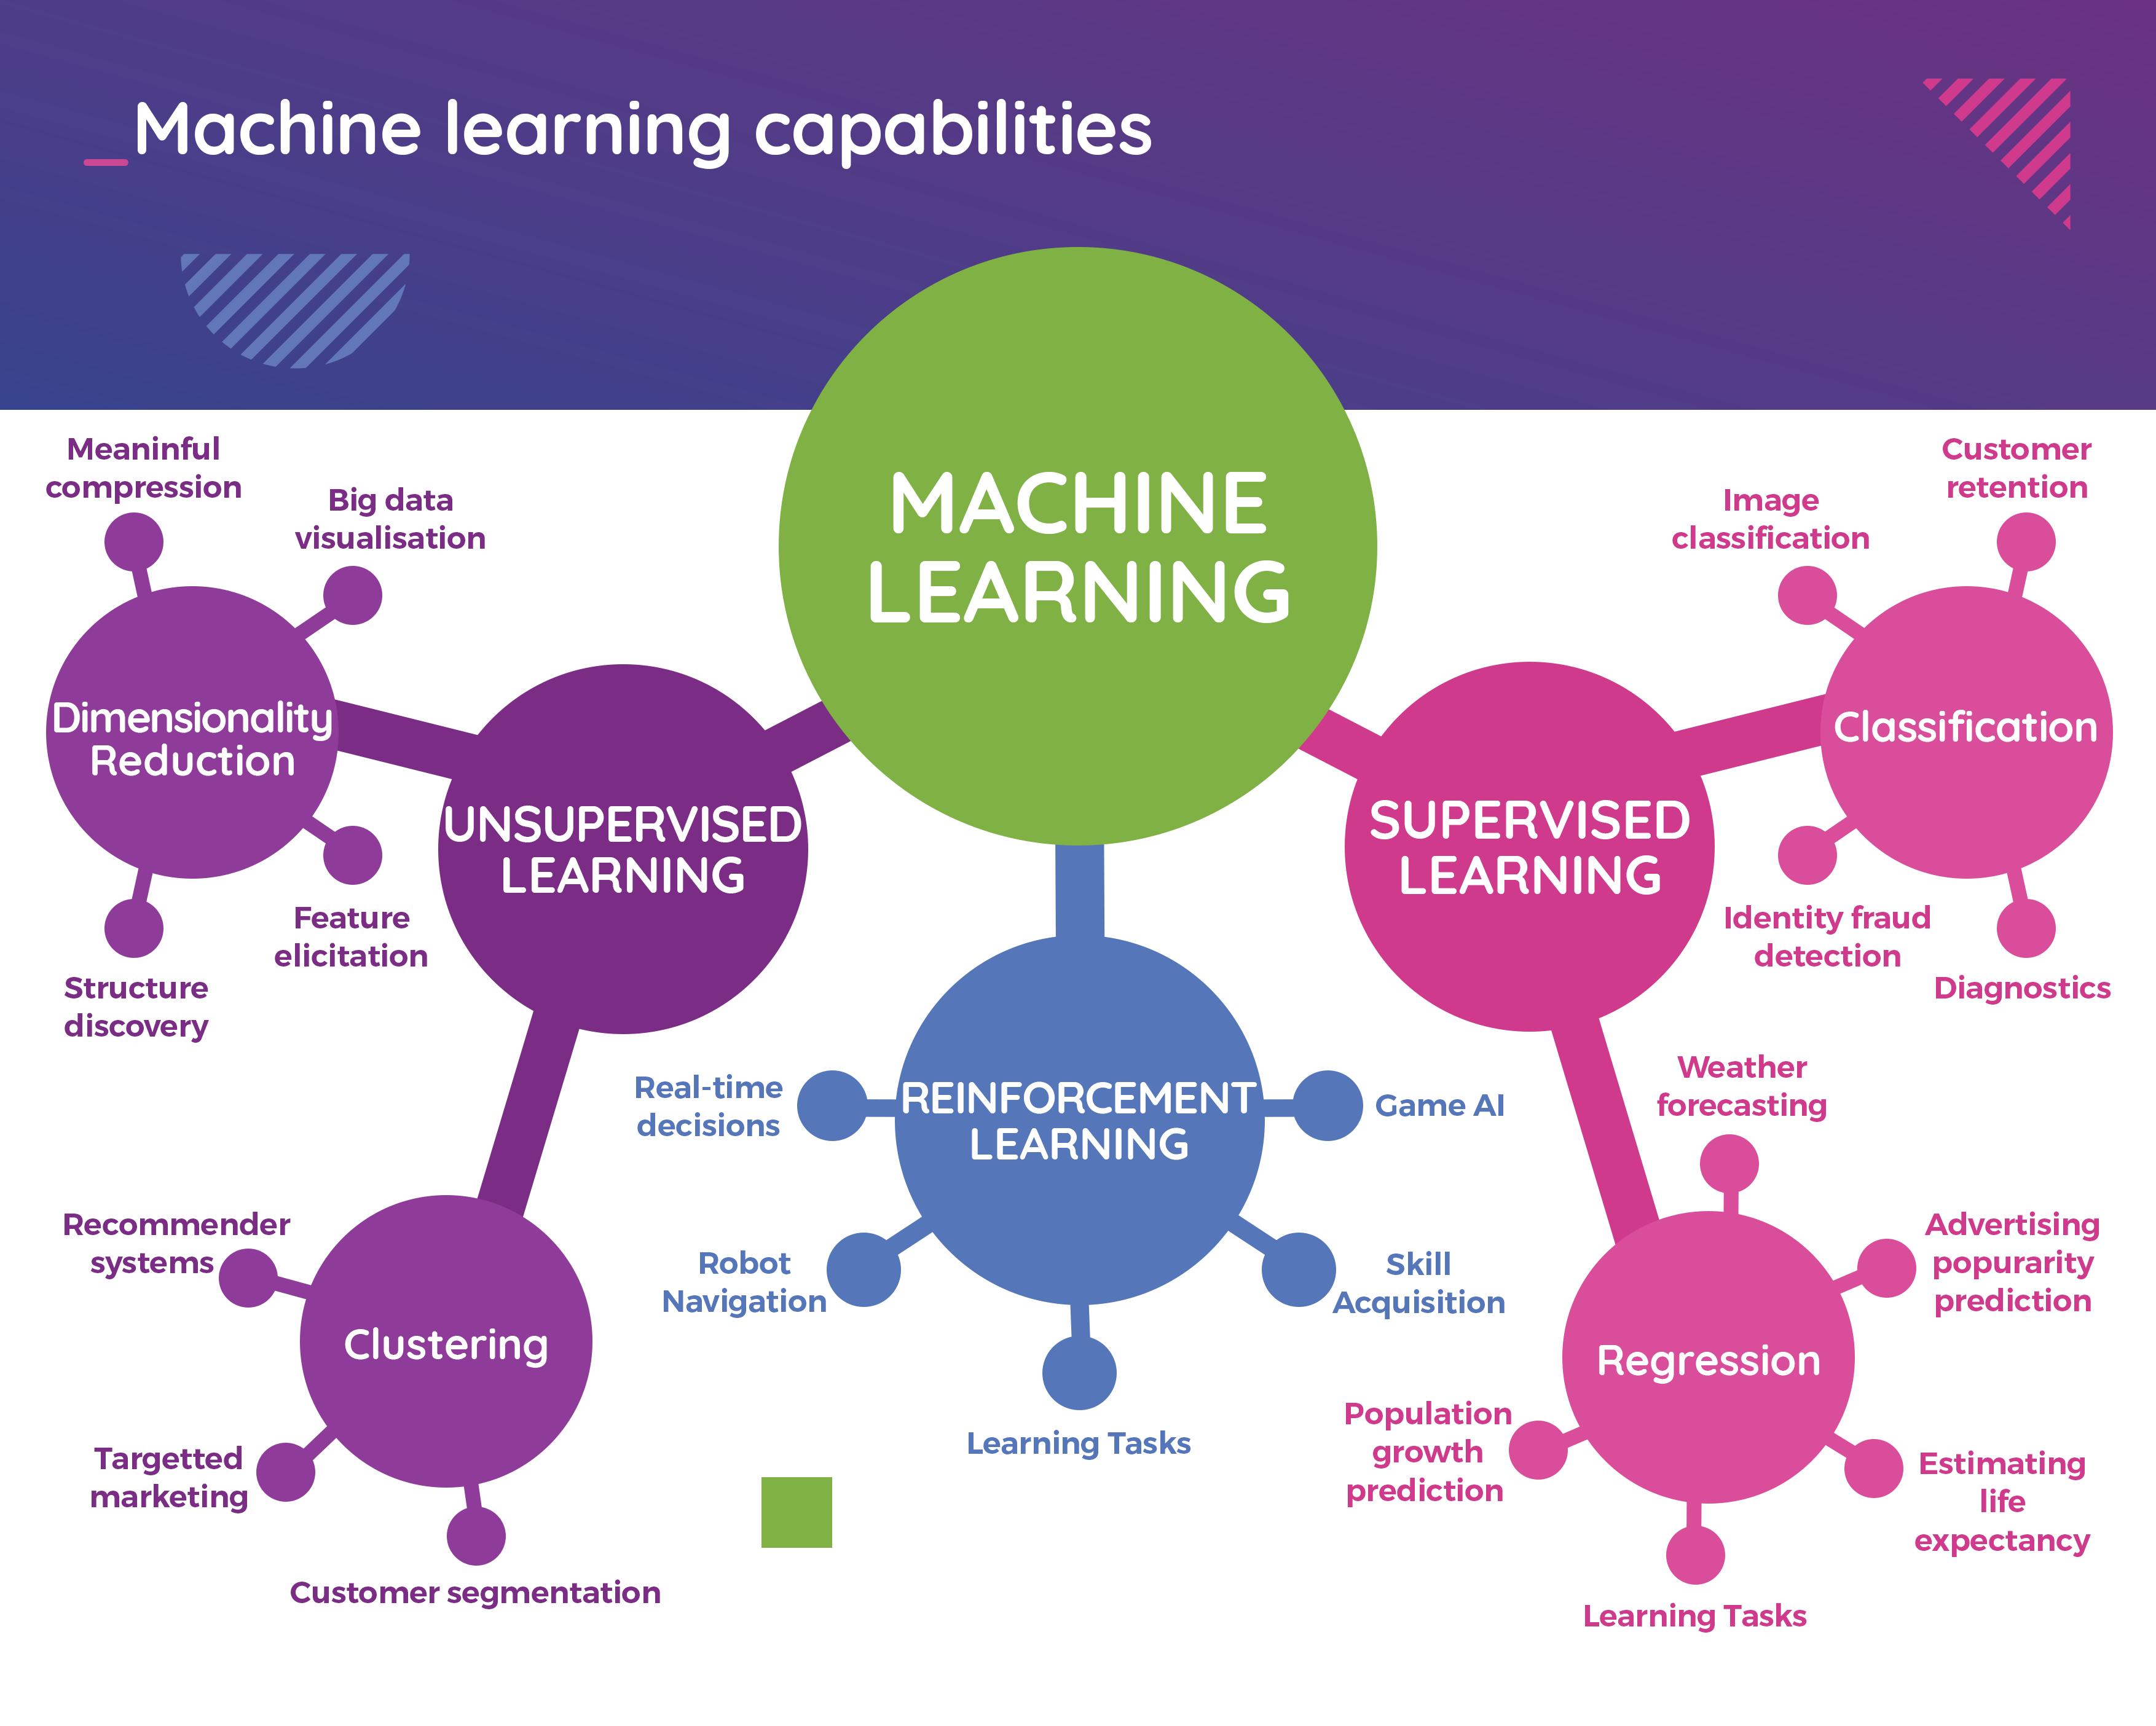 Machine learning capabilities